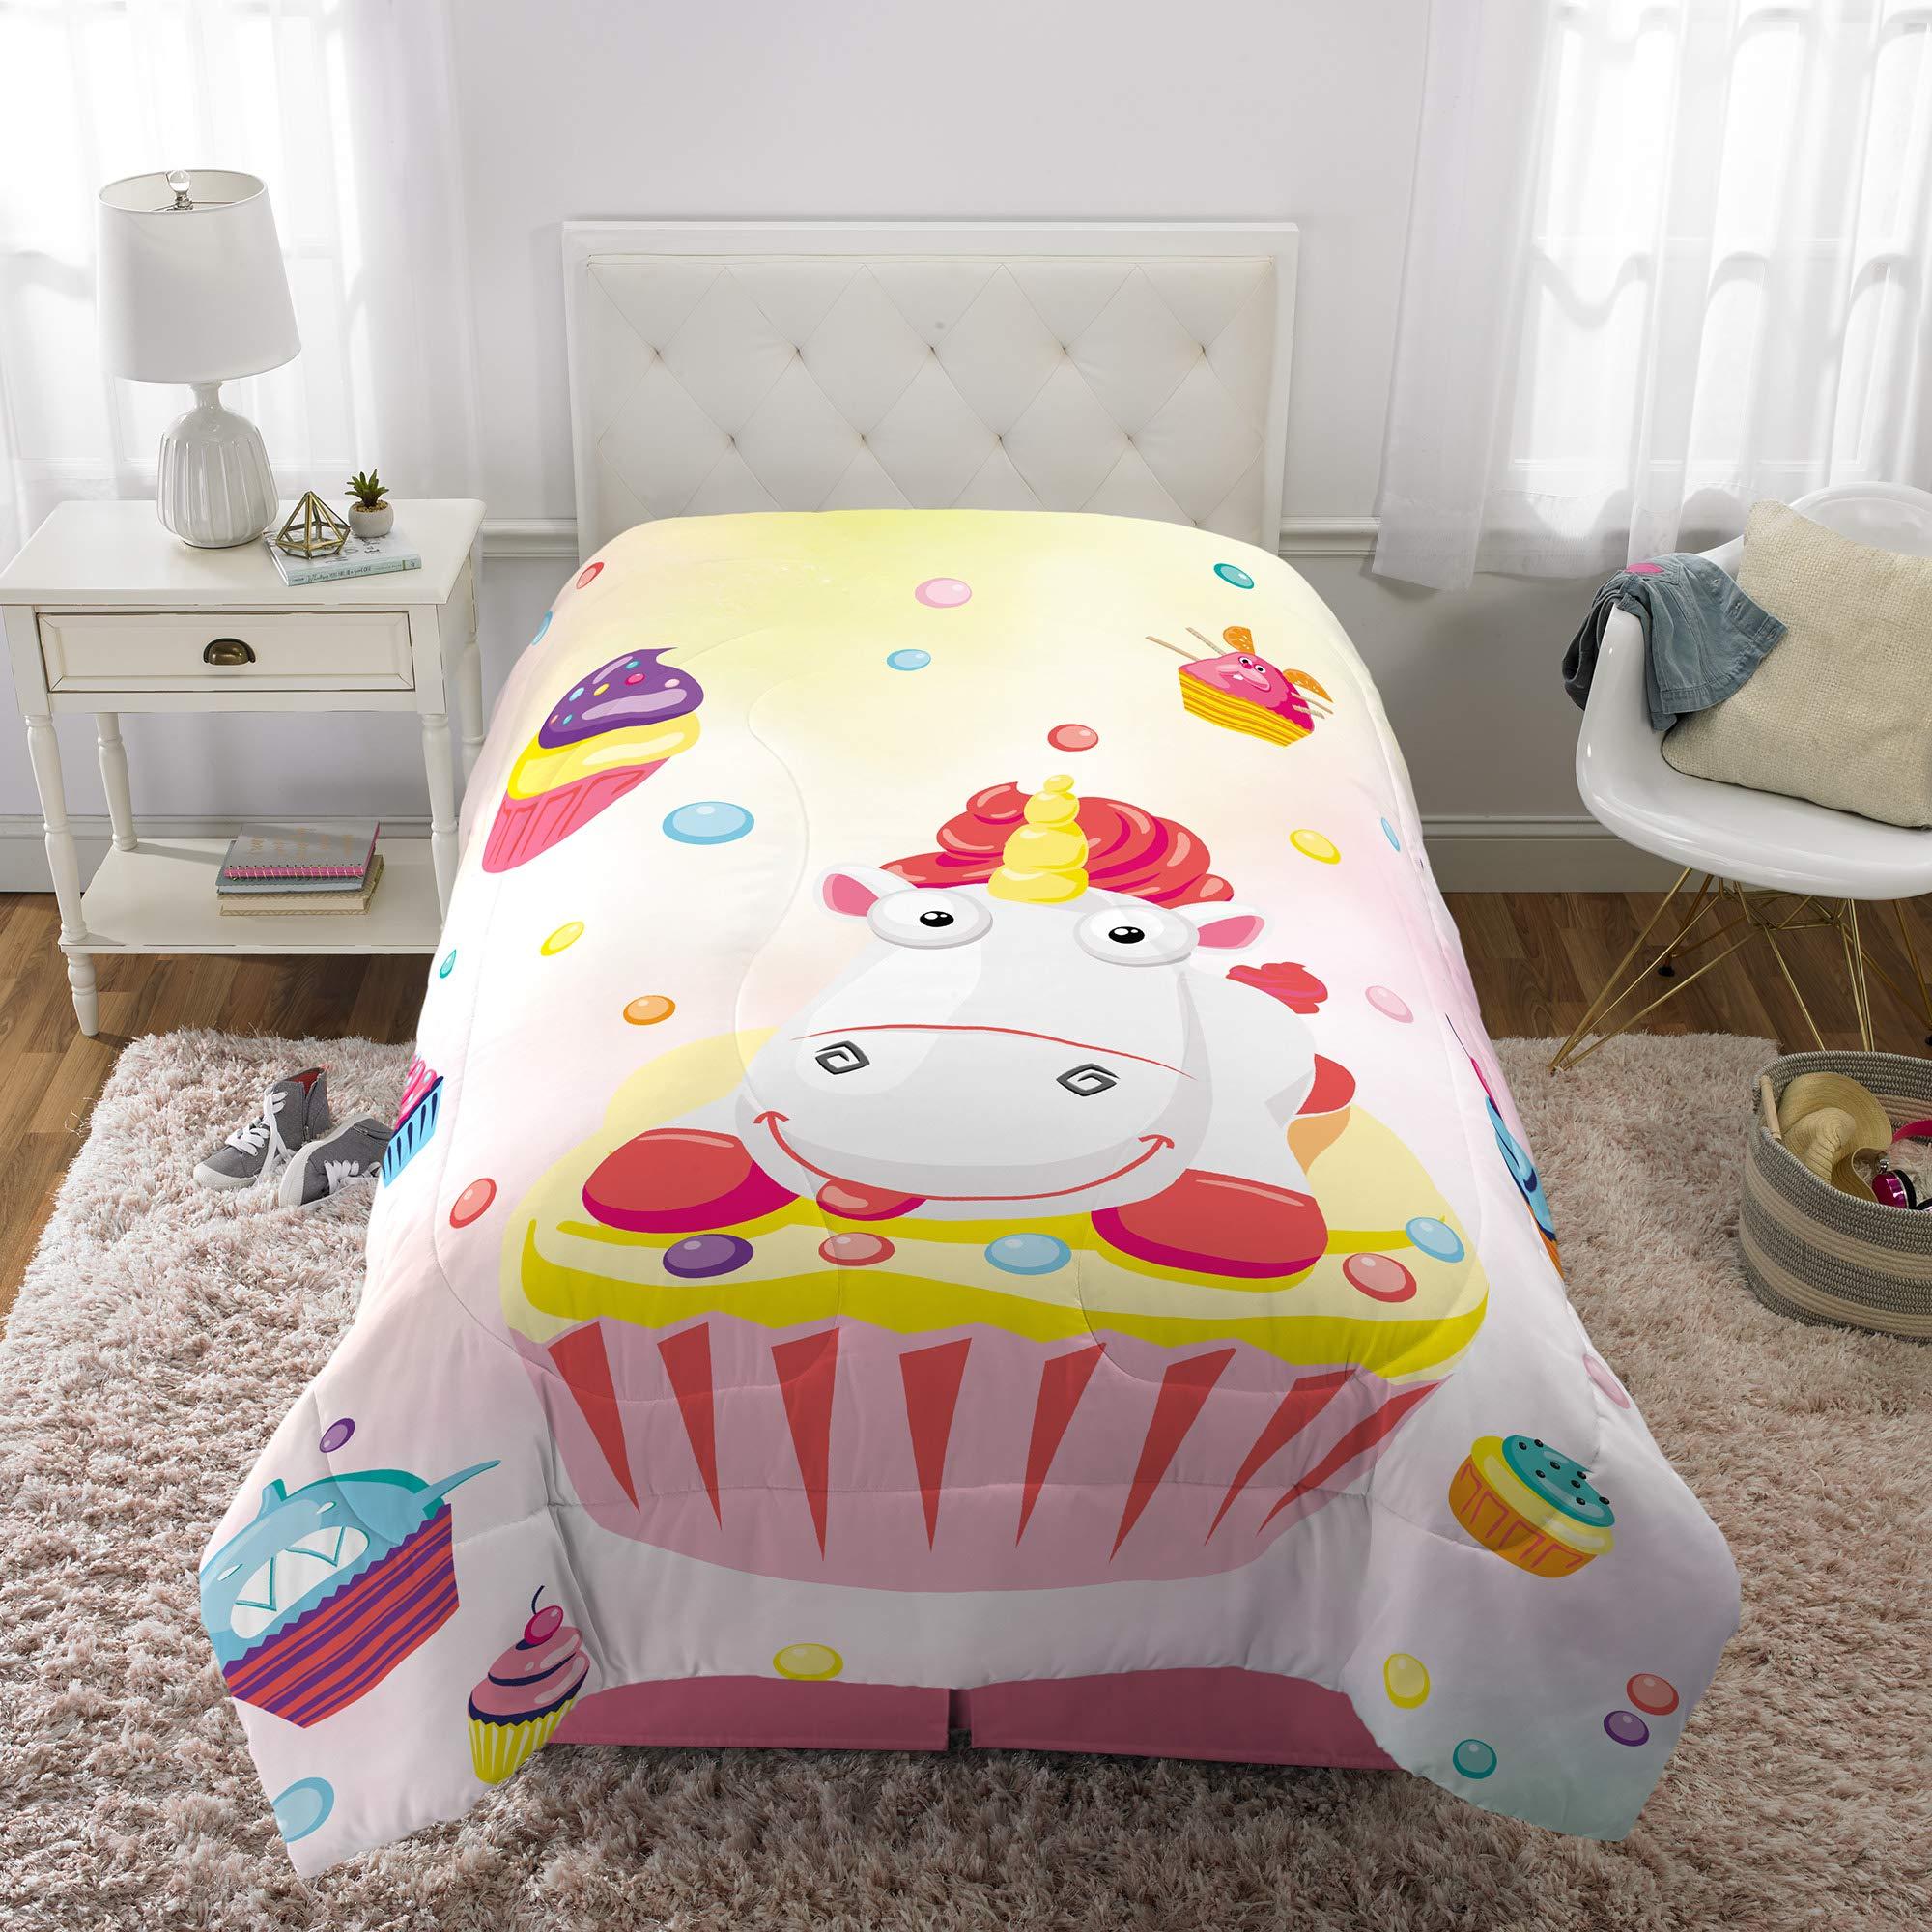 Franco Kids Bedding Super Soft Microfiber Reversible Comforter, Twin/Full Size 72'' x 86'', Fluffy Unicorn by Franco